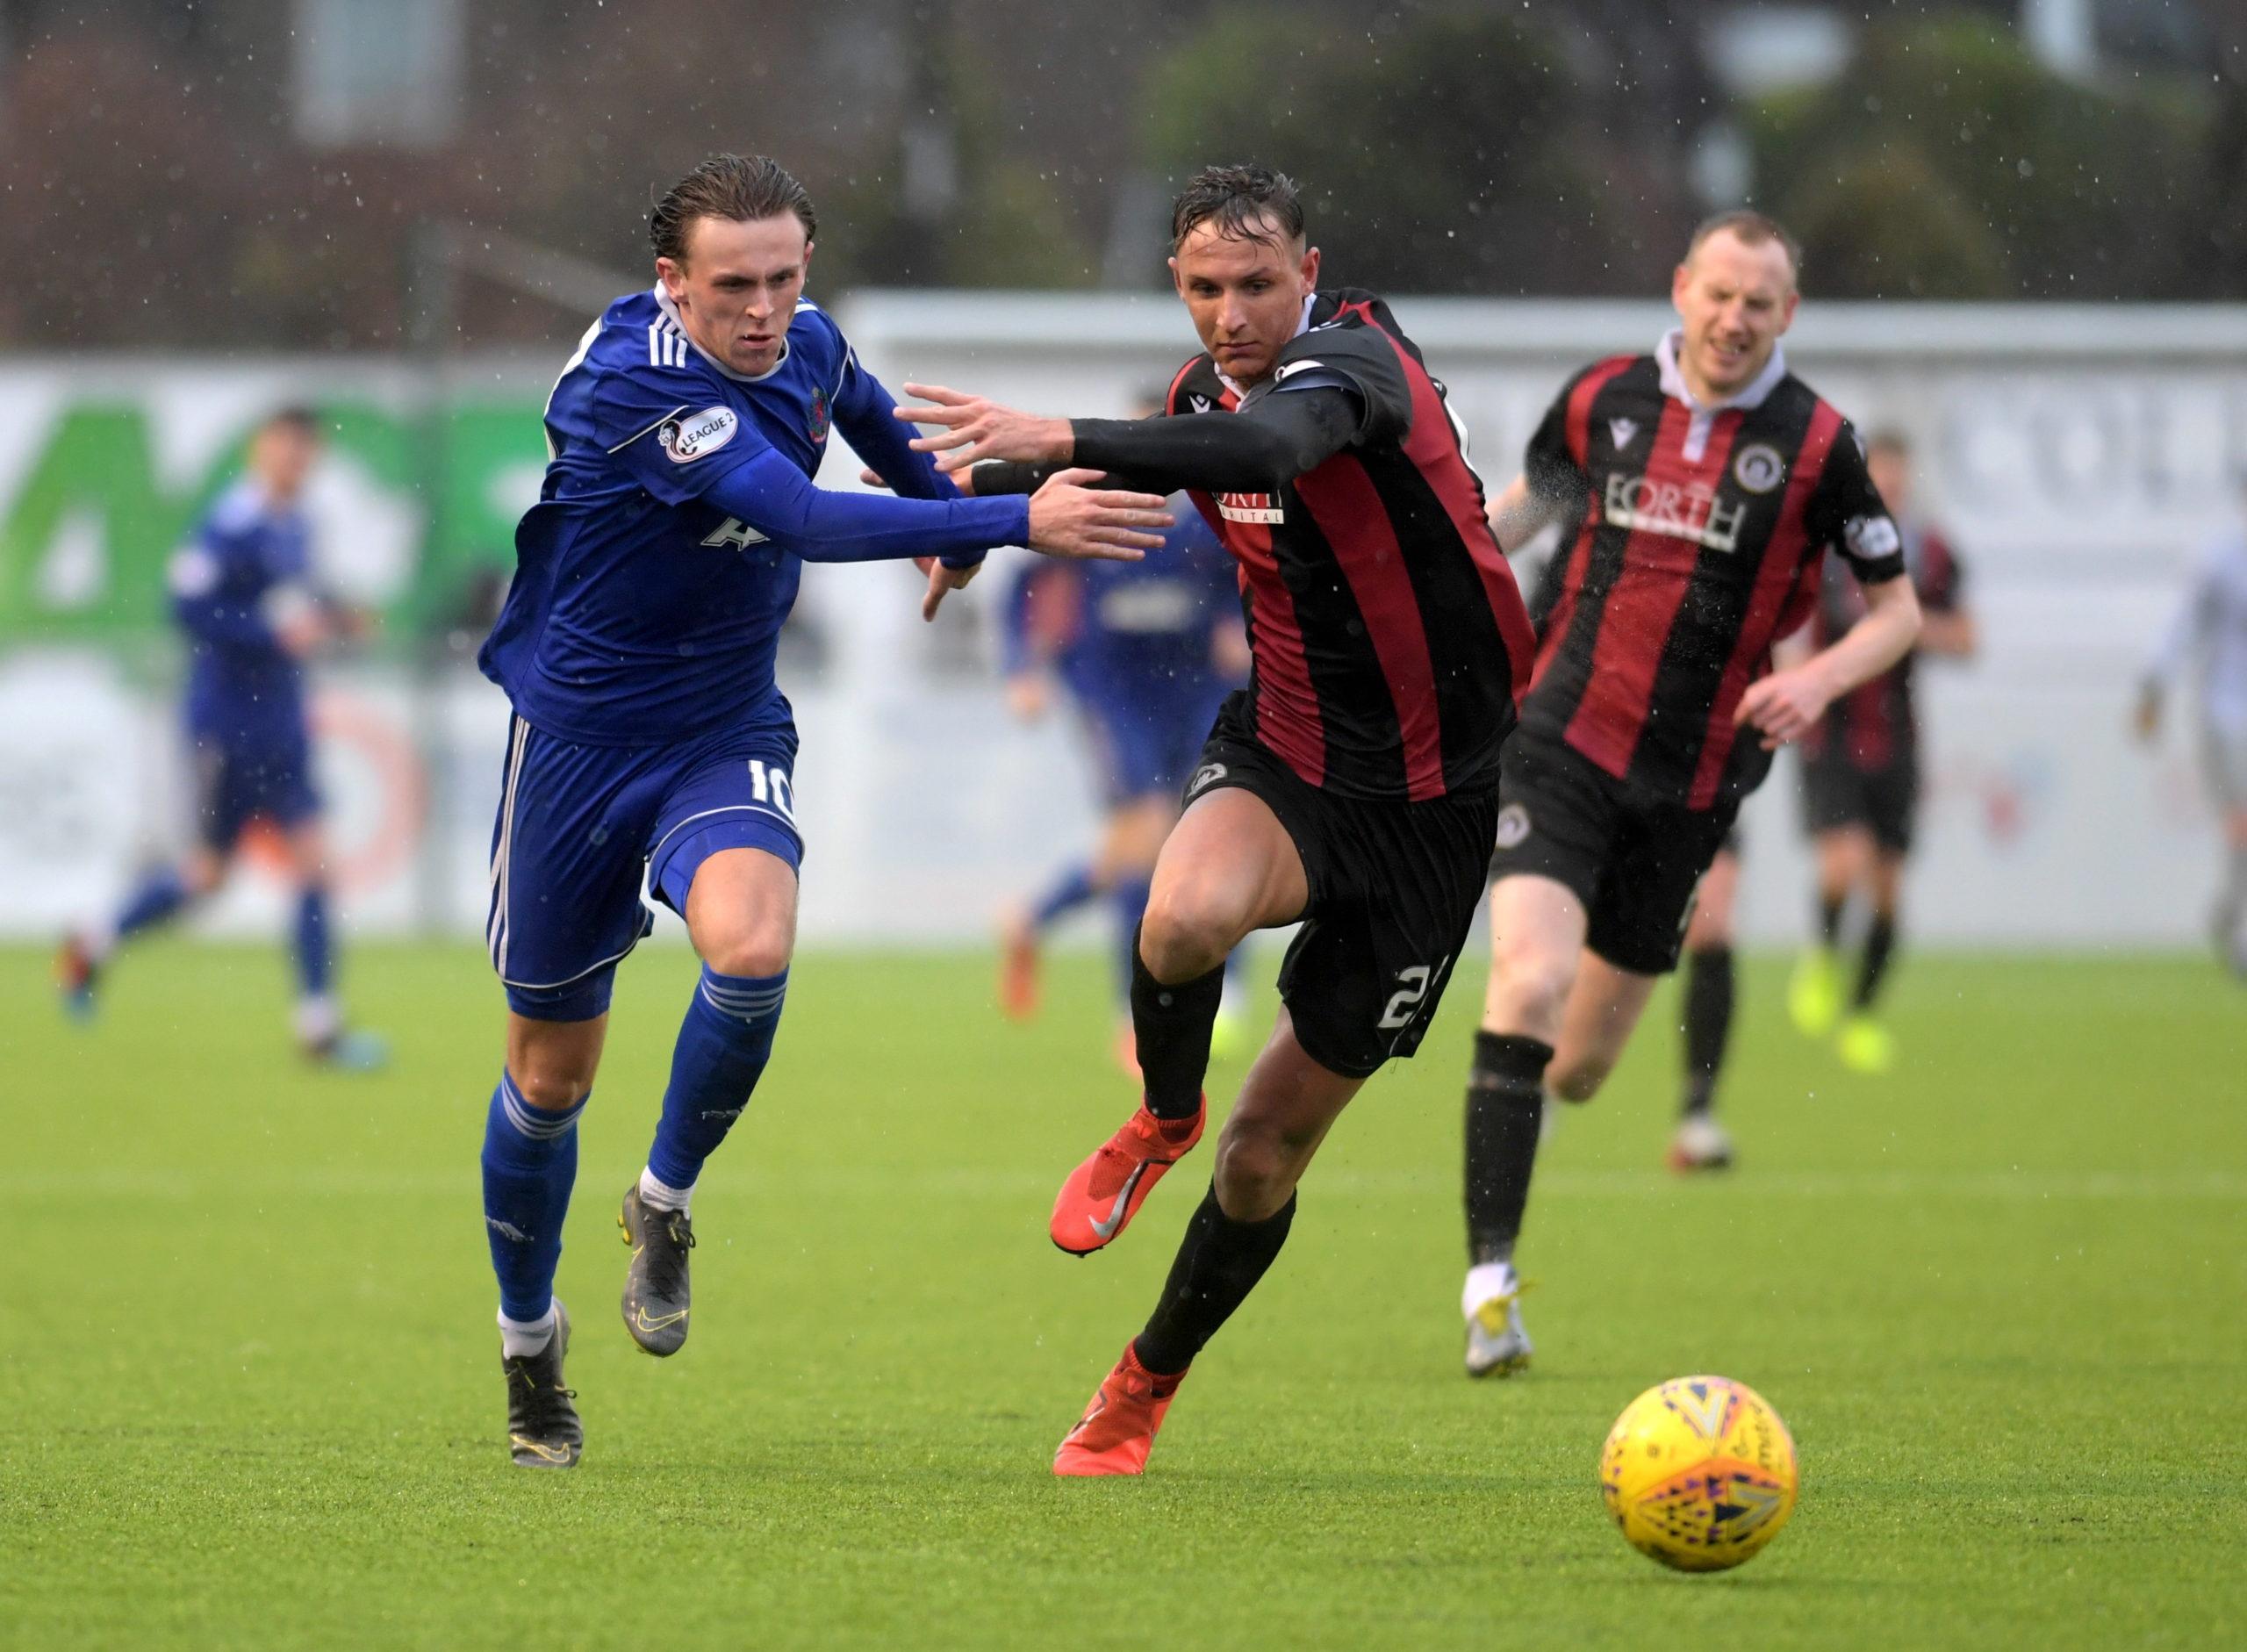 Broque Watson (left) in action against Edinburgh City.